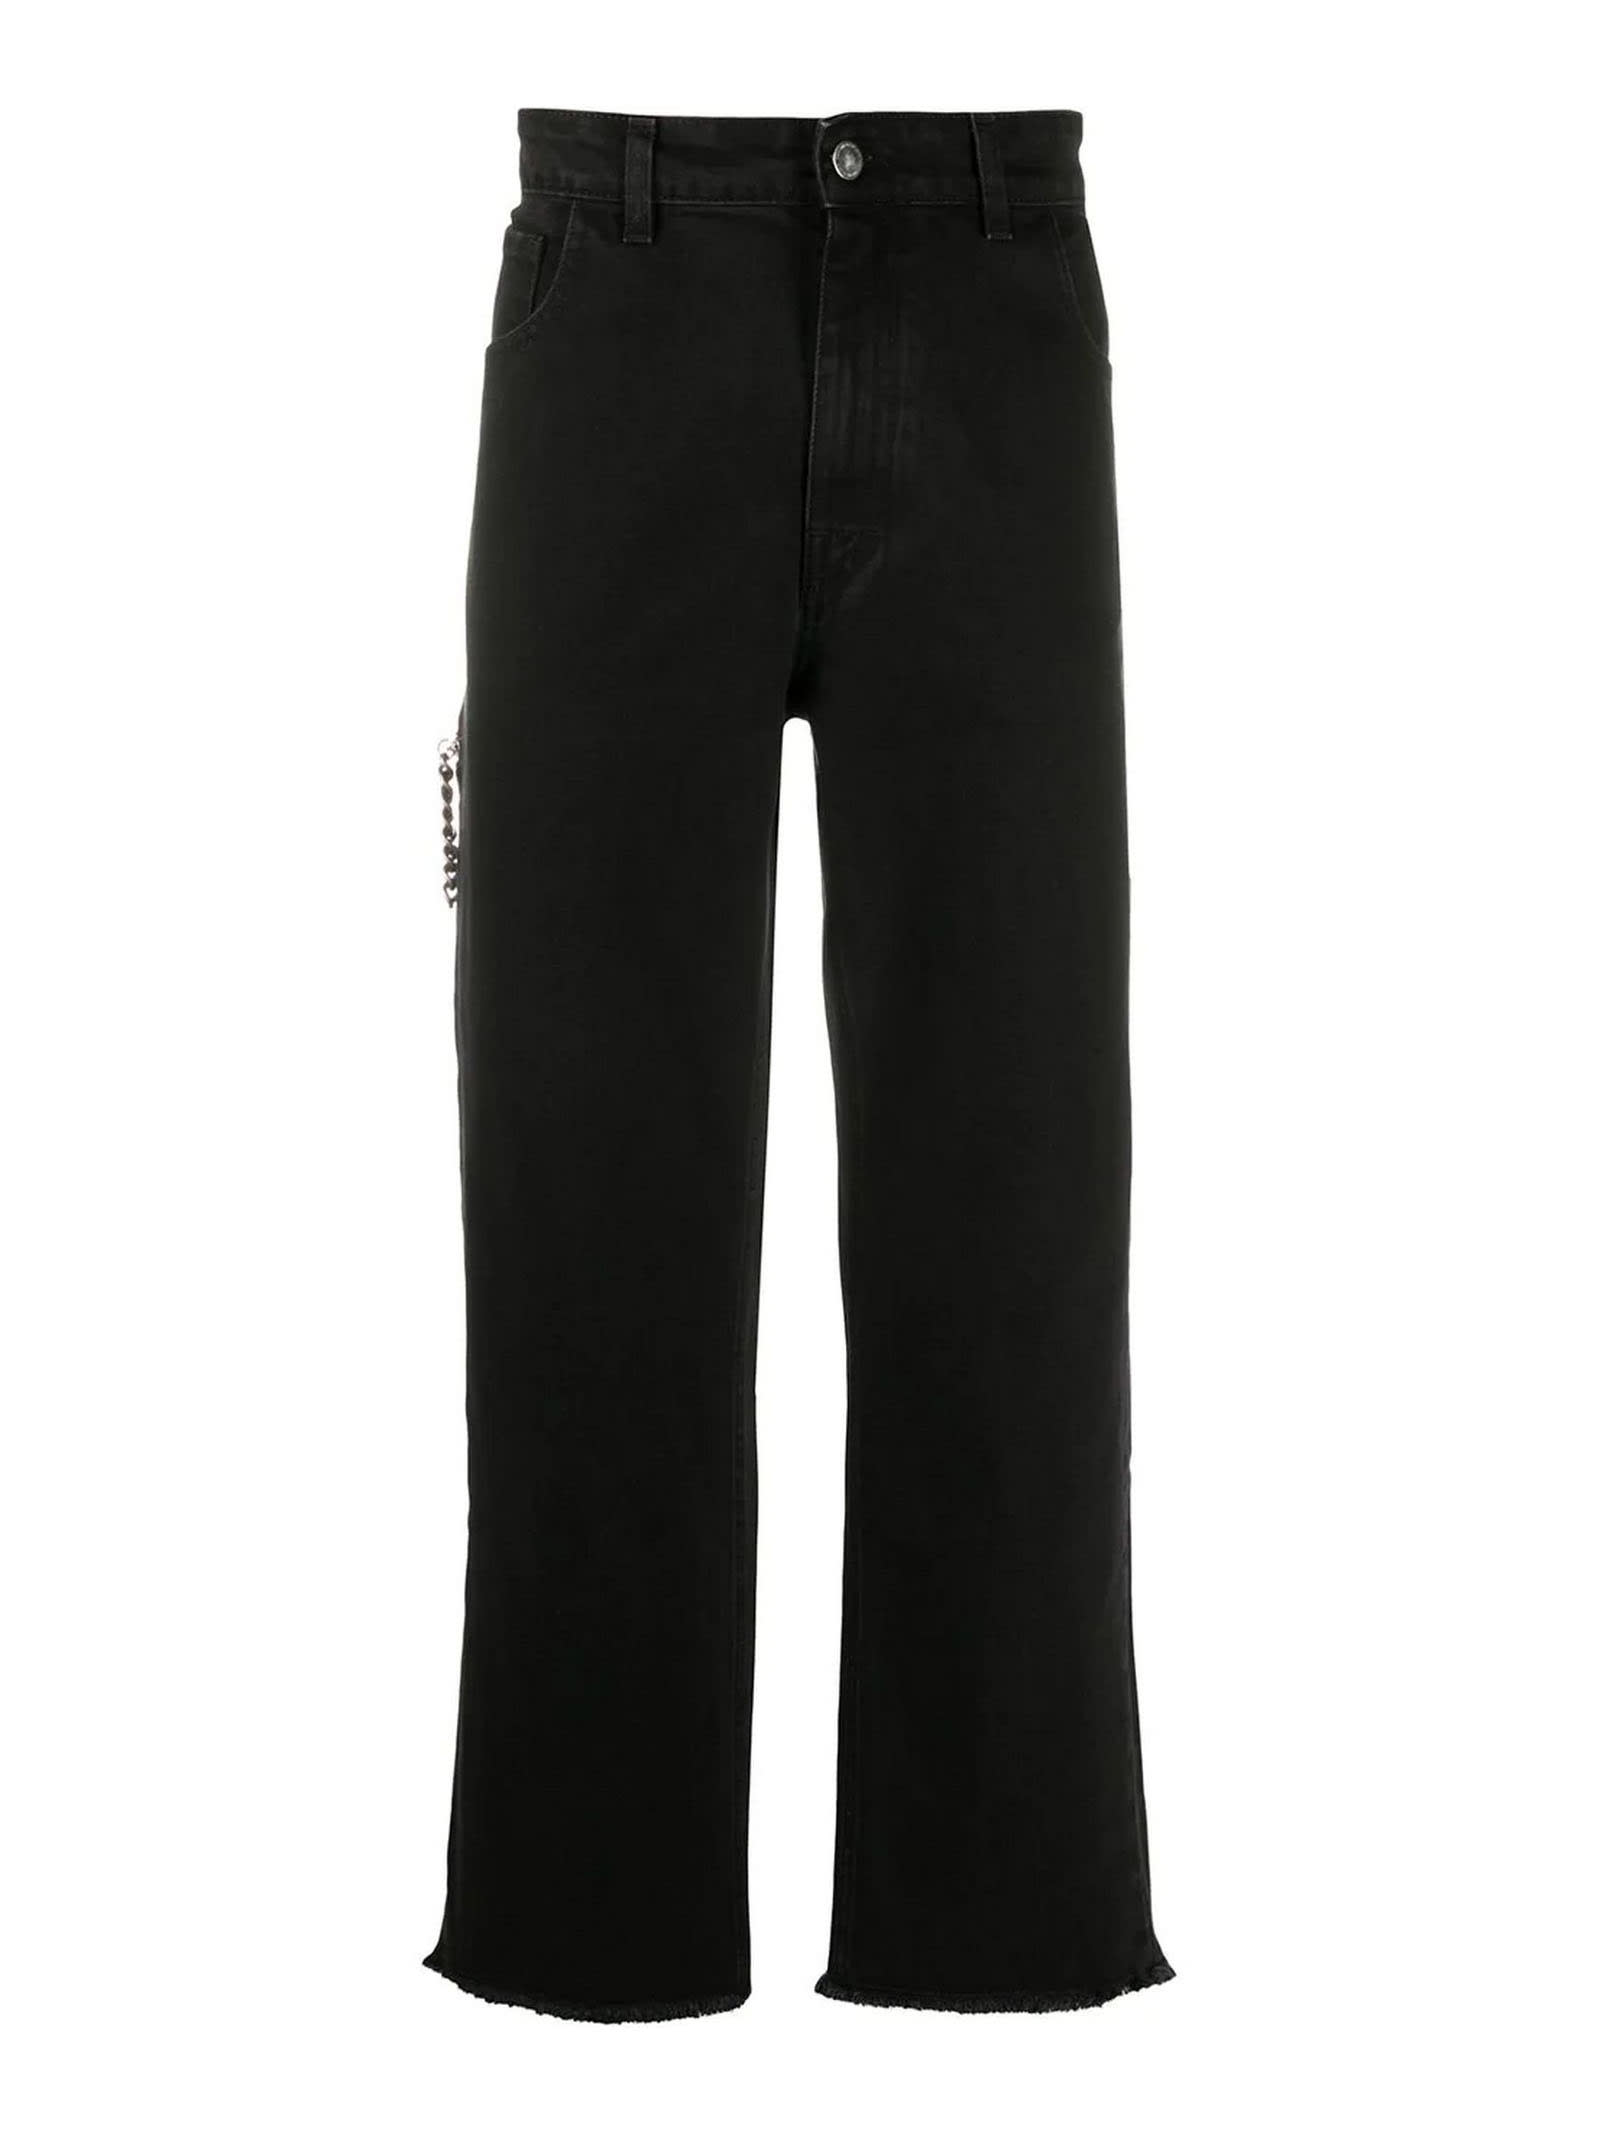 Raf Simons Black Cotton Jeans